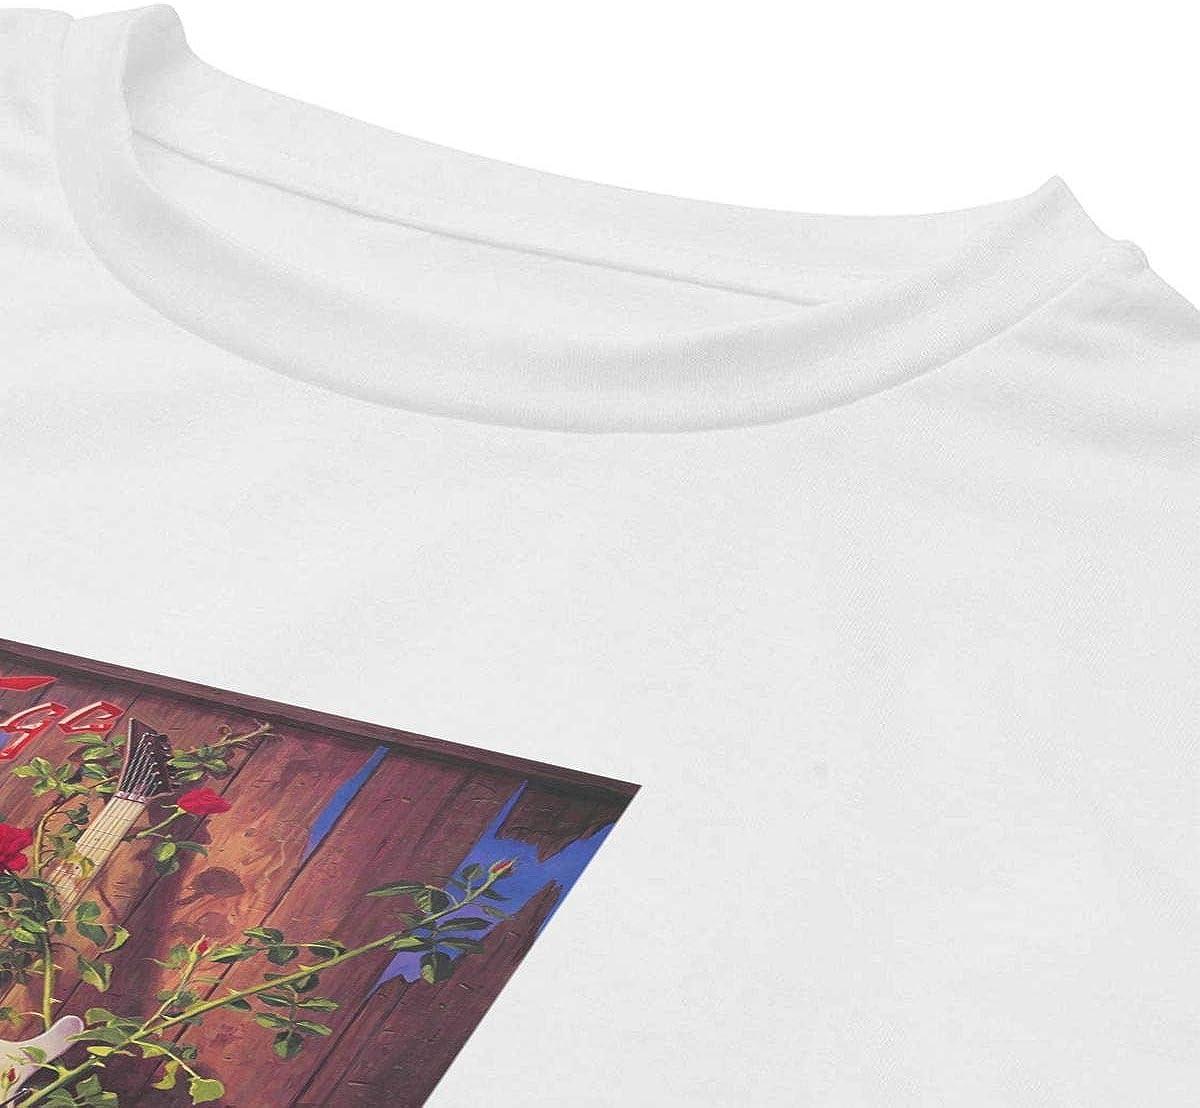 AMZOPDGS Savatage Womens Short-Sleeved Summer Cotton T-Shirt Fashion Round Neck Casual TopBlack